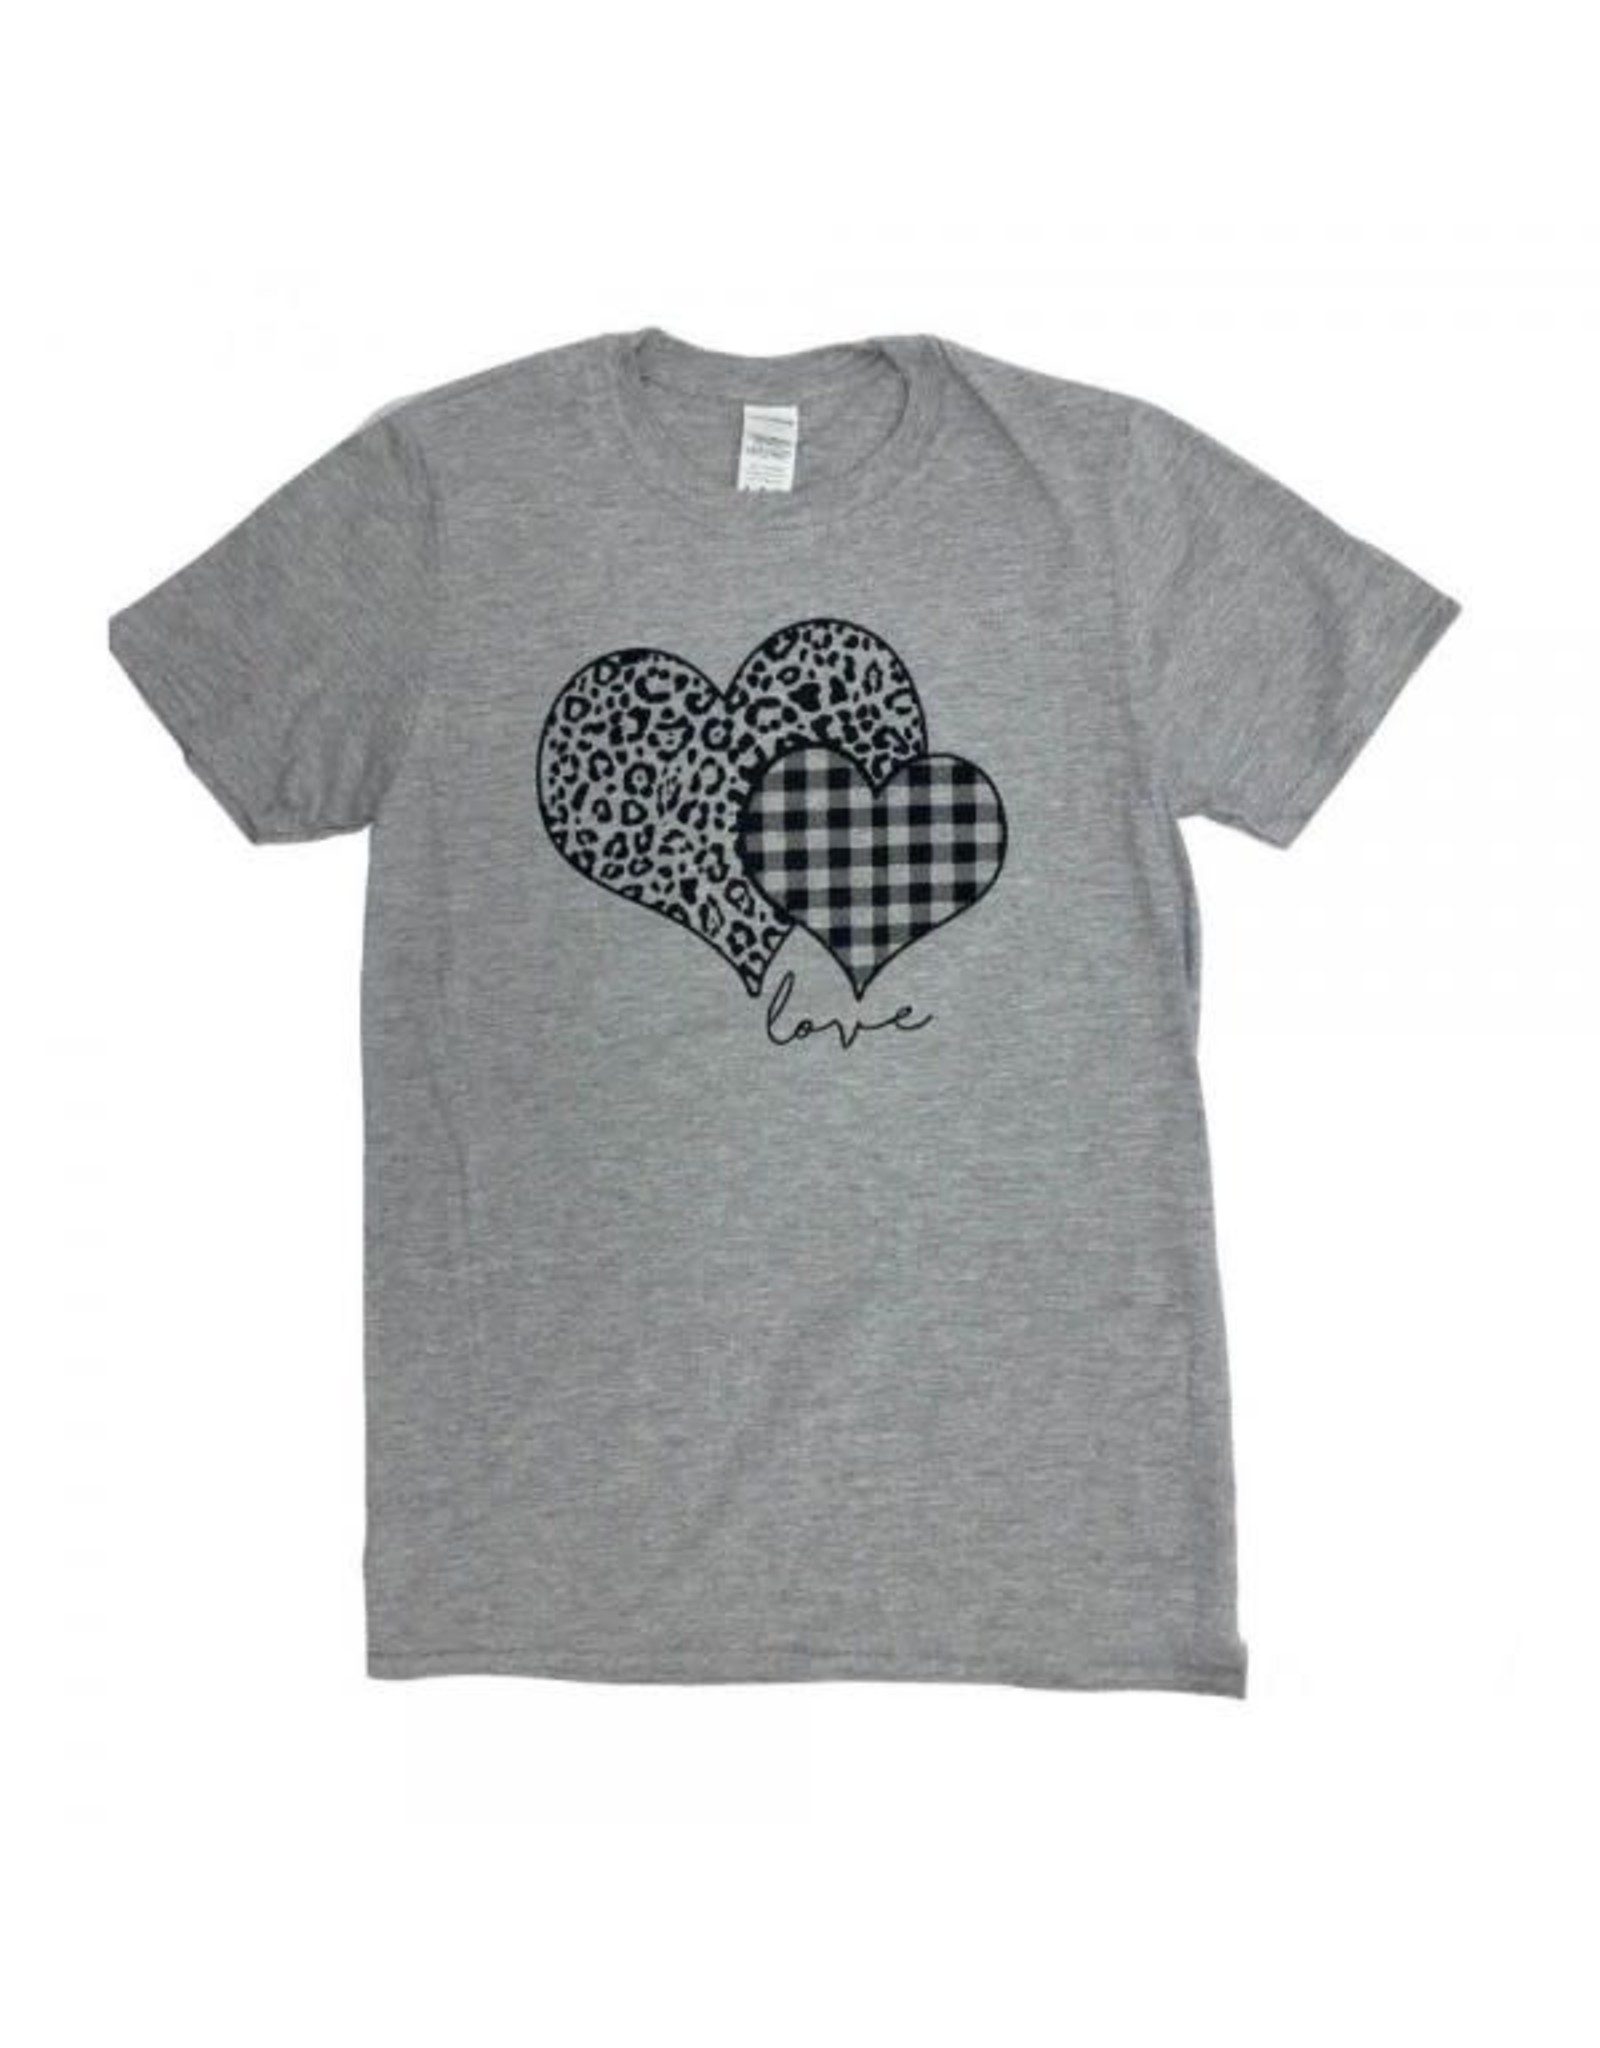 Medium Plaid Leopard Print Heart TShirt